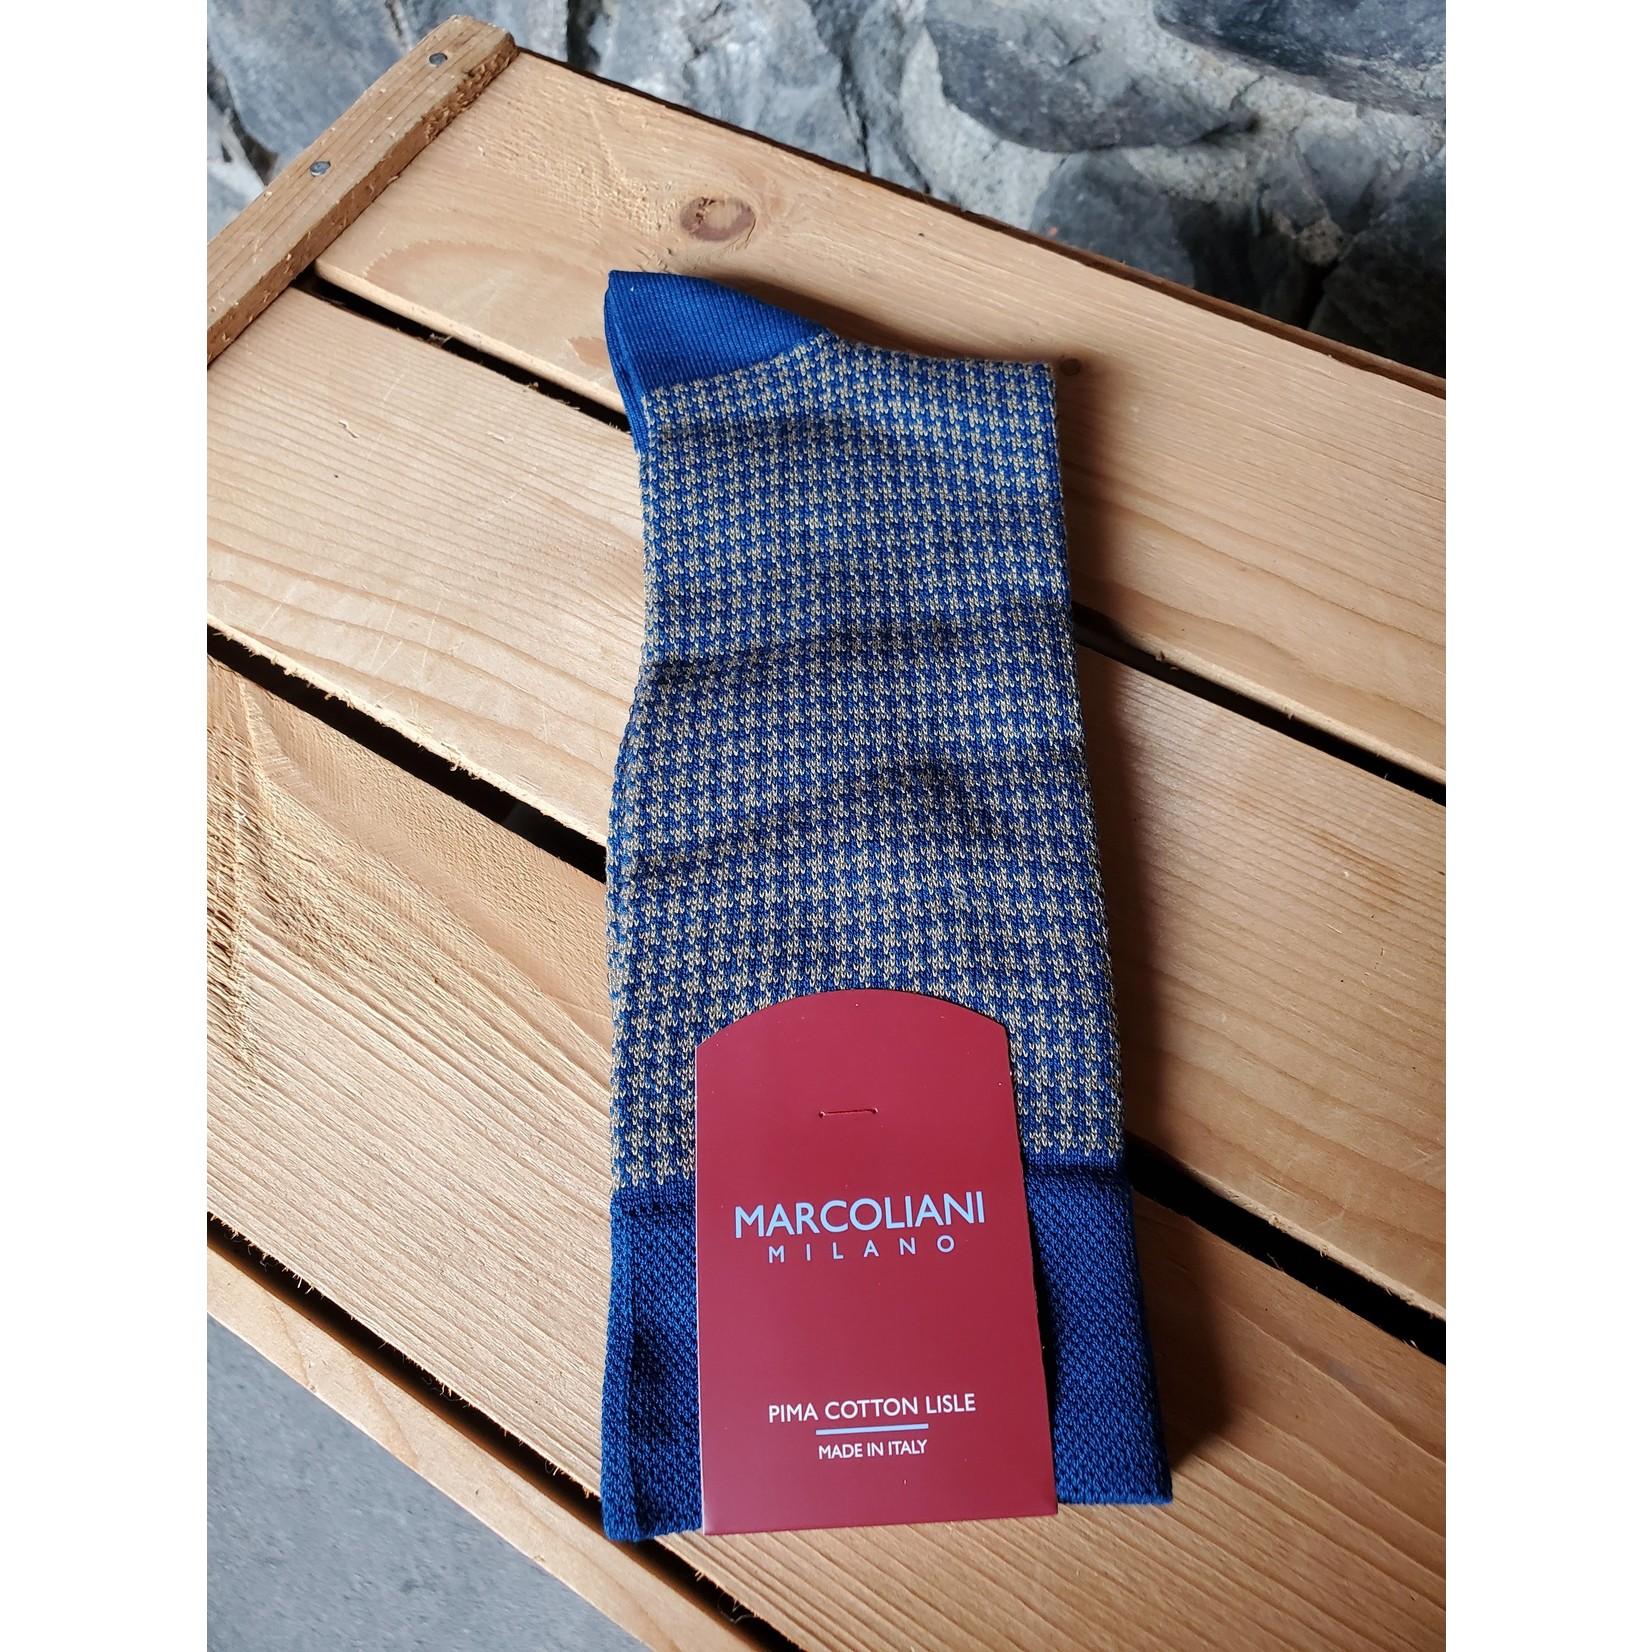 Marcoliani Marcoliani MAR3808T Pima Cotton Lisle Houndstooth Y29 Blue/Beige